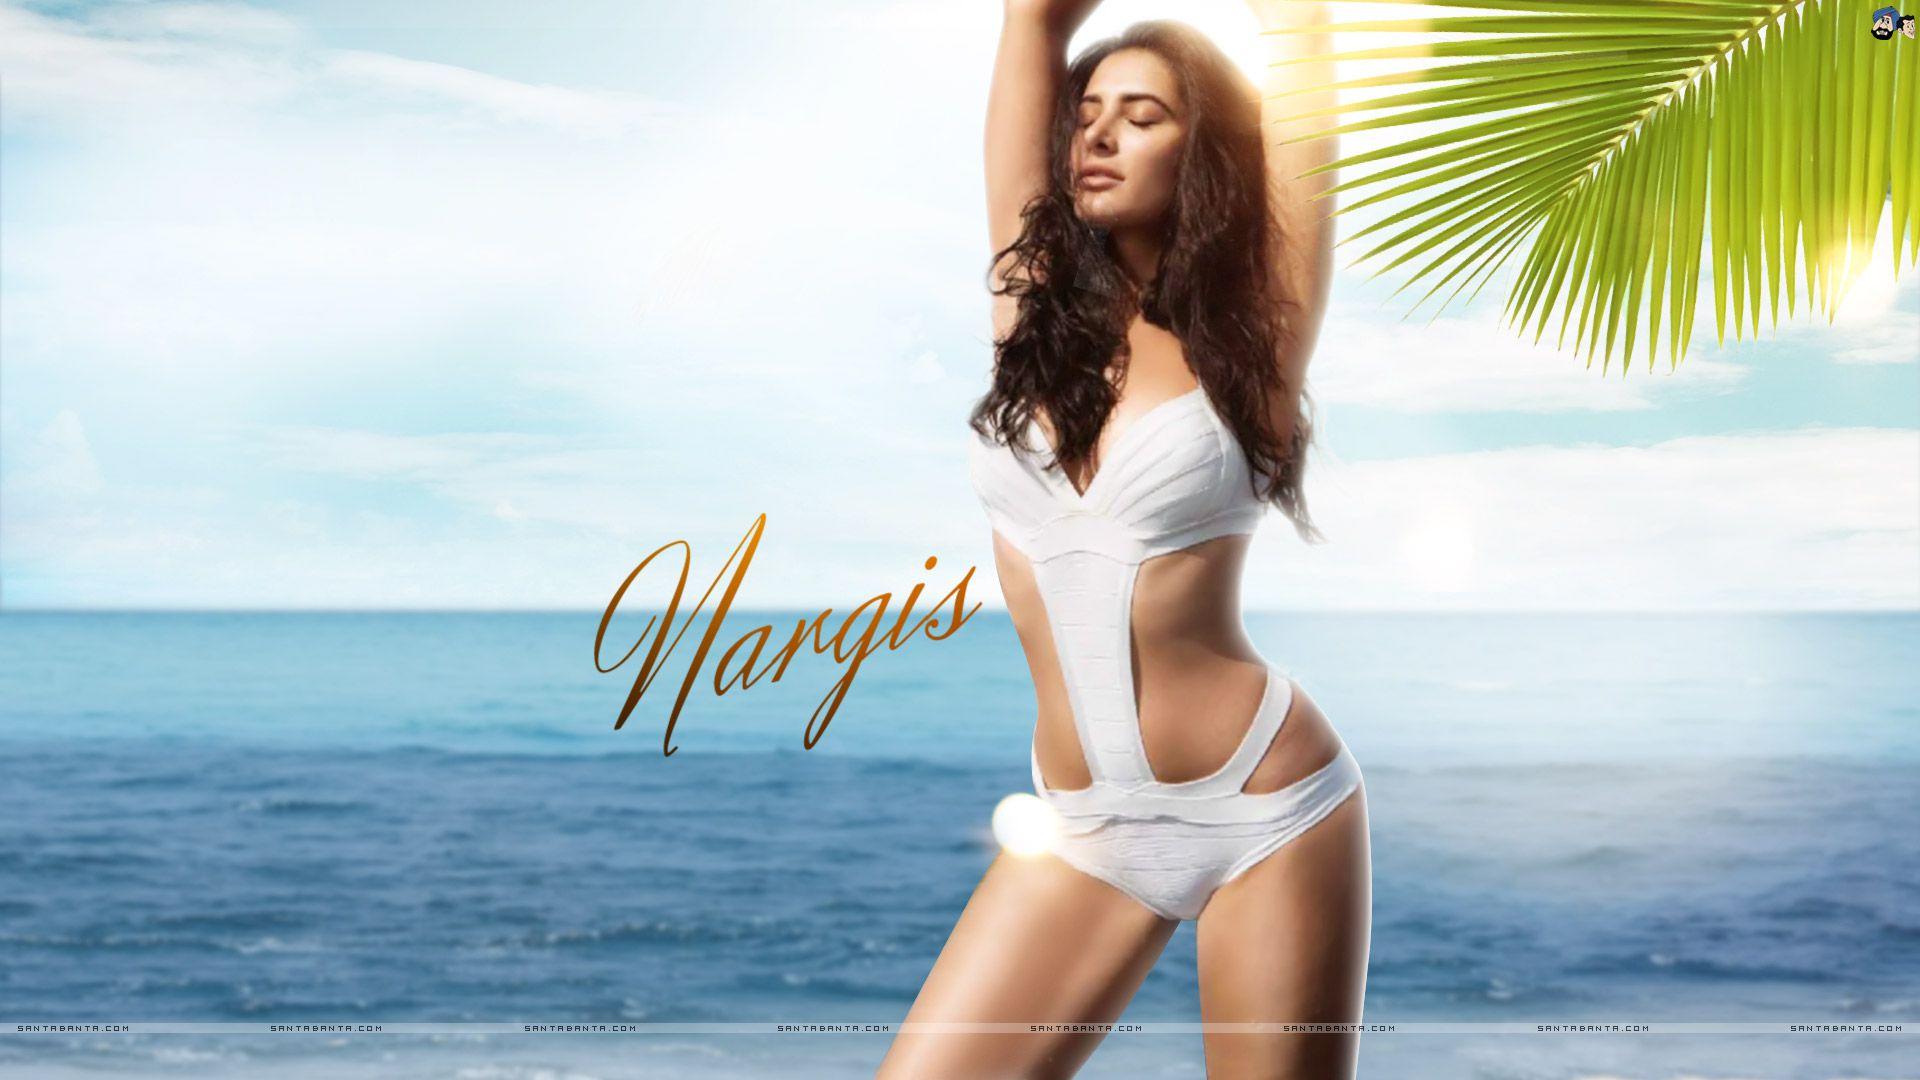 nargis-fakhri-44a.jpg